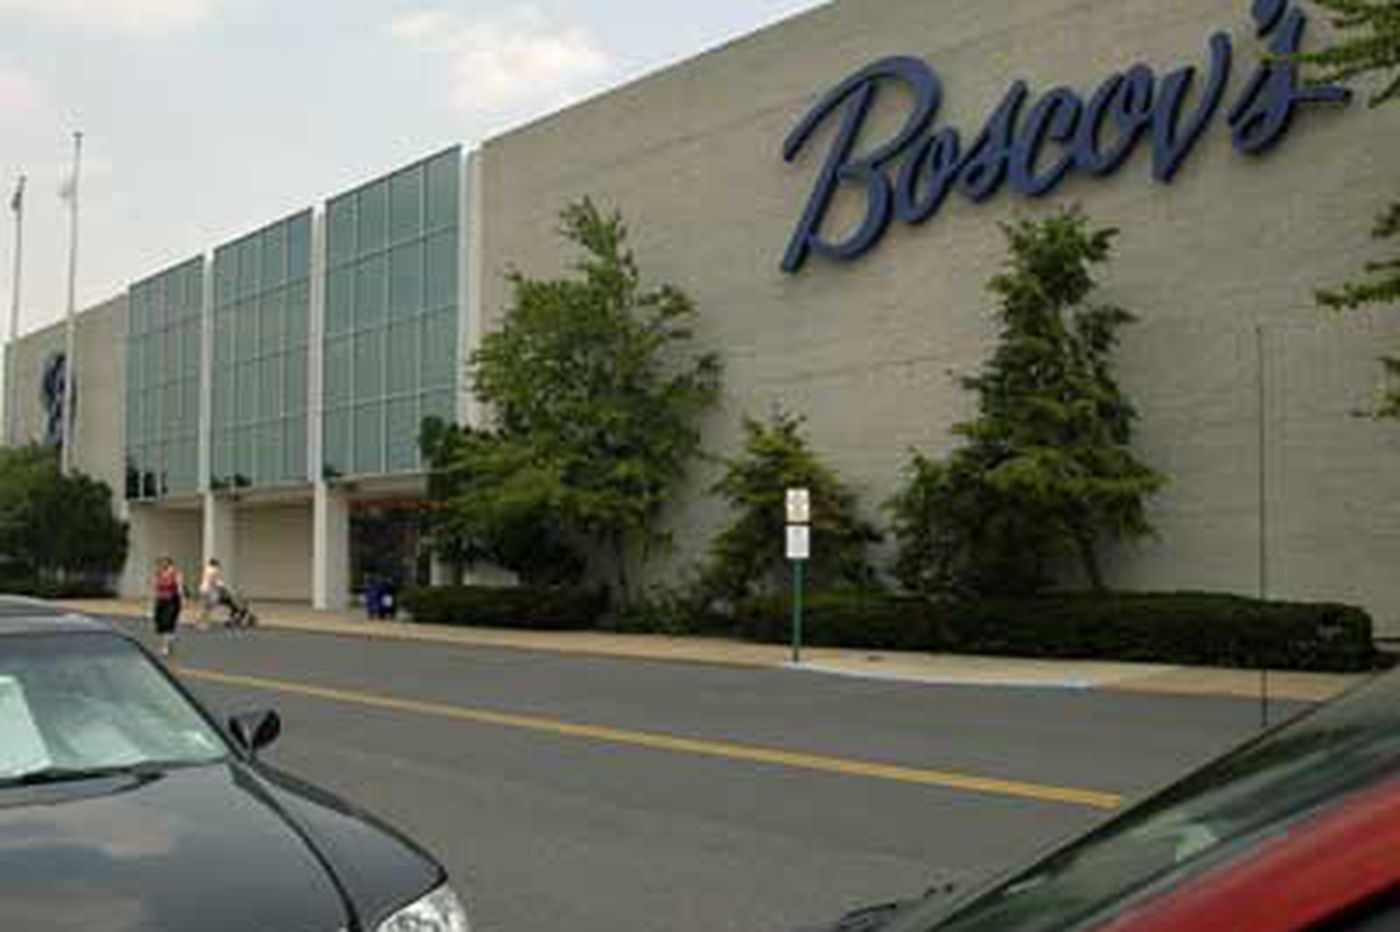 Boscov's sails into retail turbulence